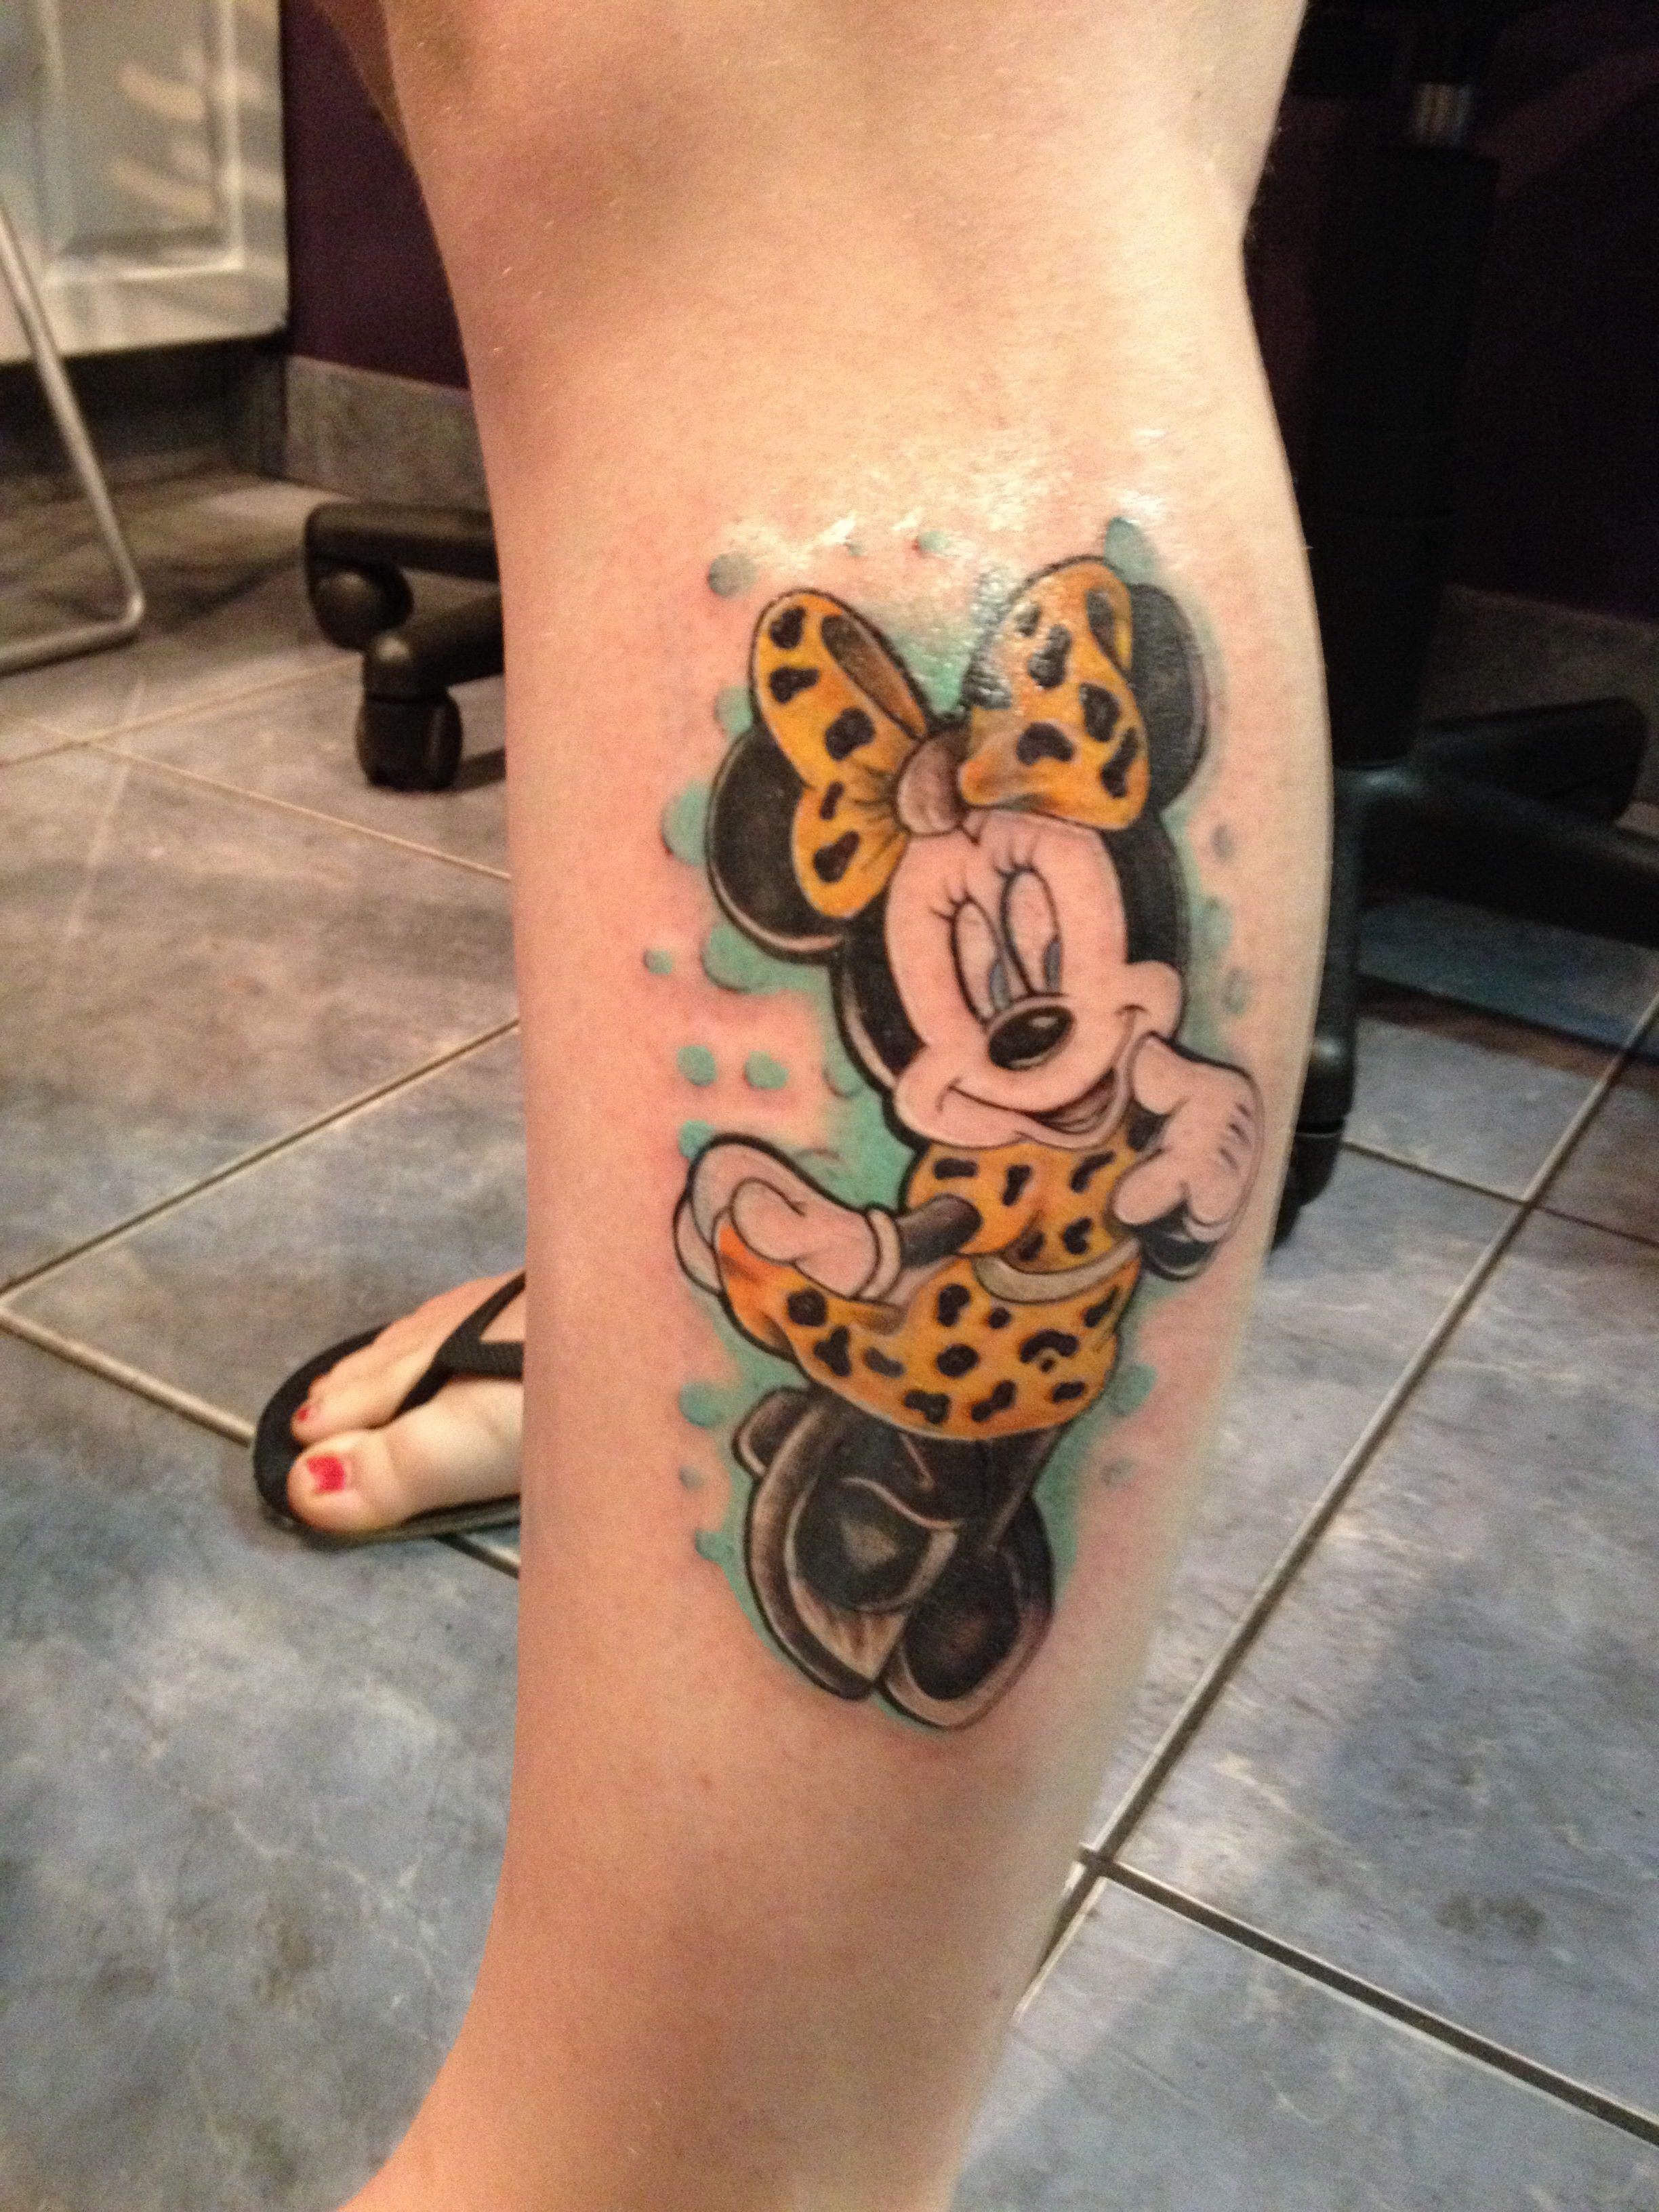 My Minnie Mouse Tattoo 3 Tattoos Disney Tattoos Mouse Tattoos